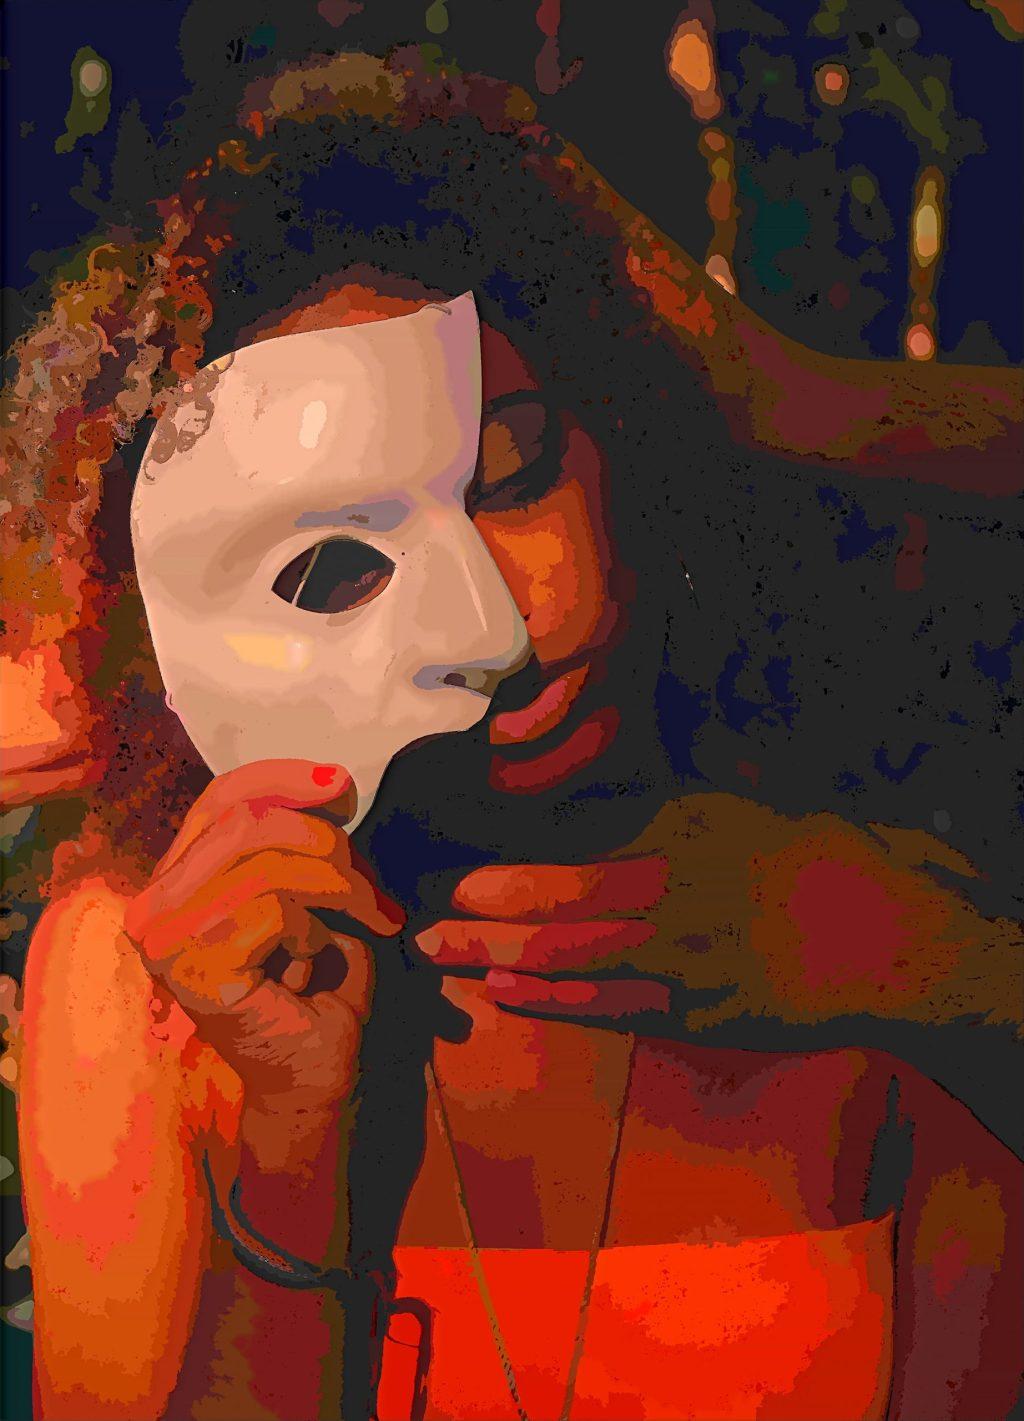 the masks we put on